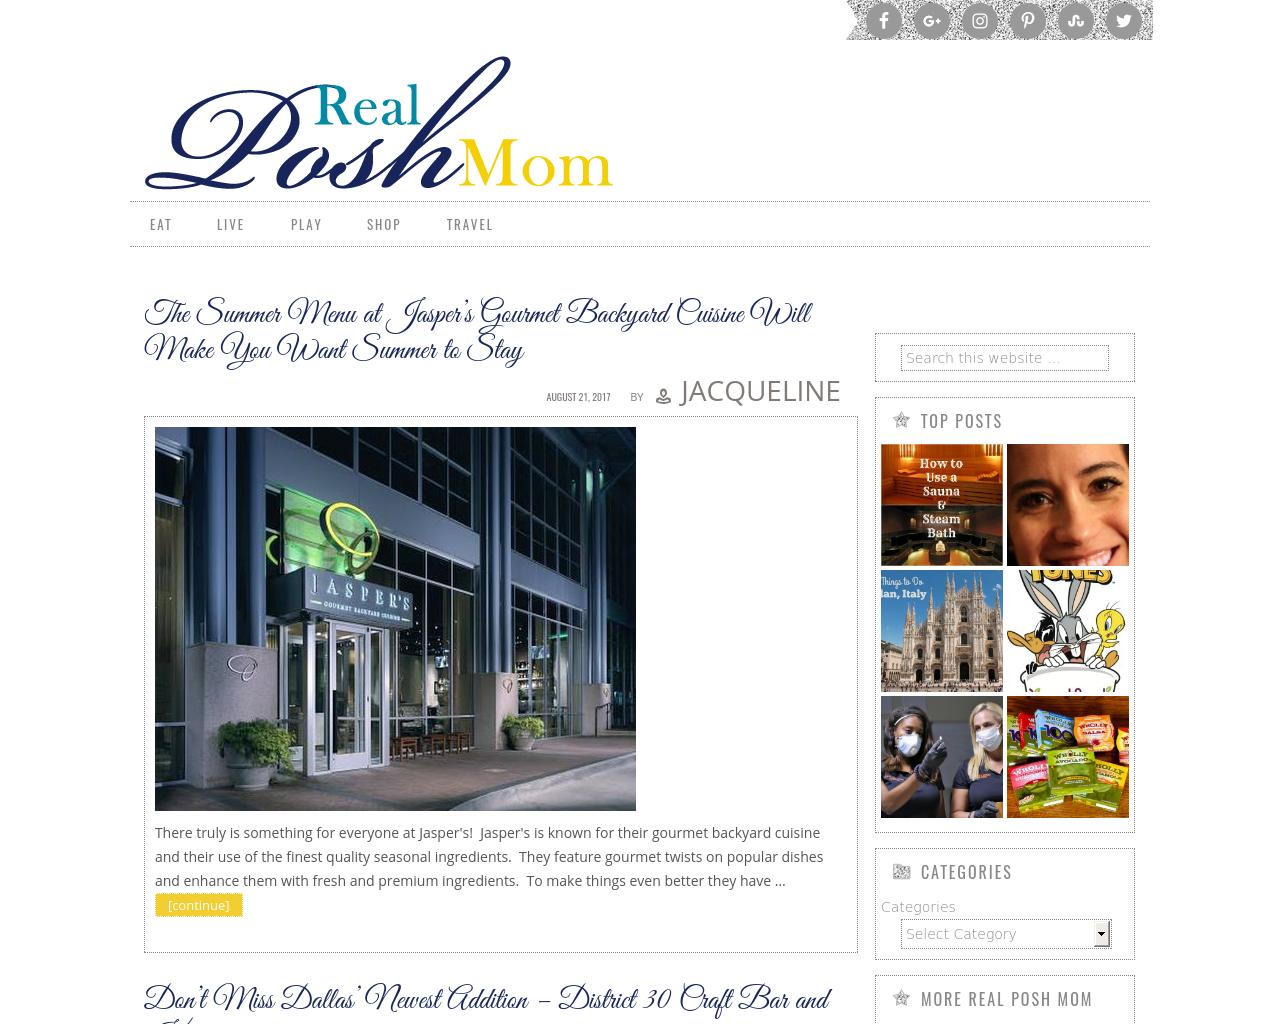 Real-Posh-Mom-Advertising-Reviews-Pricing